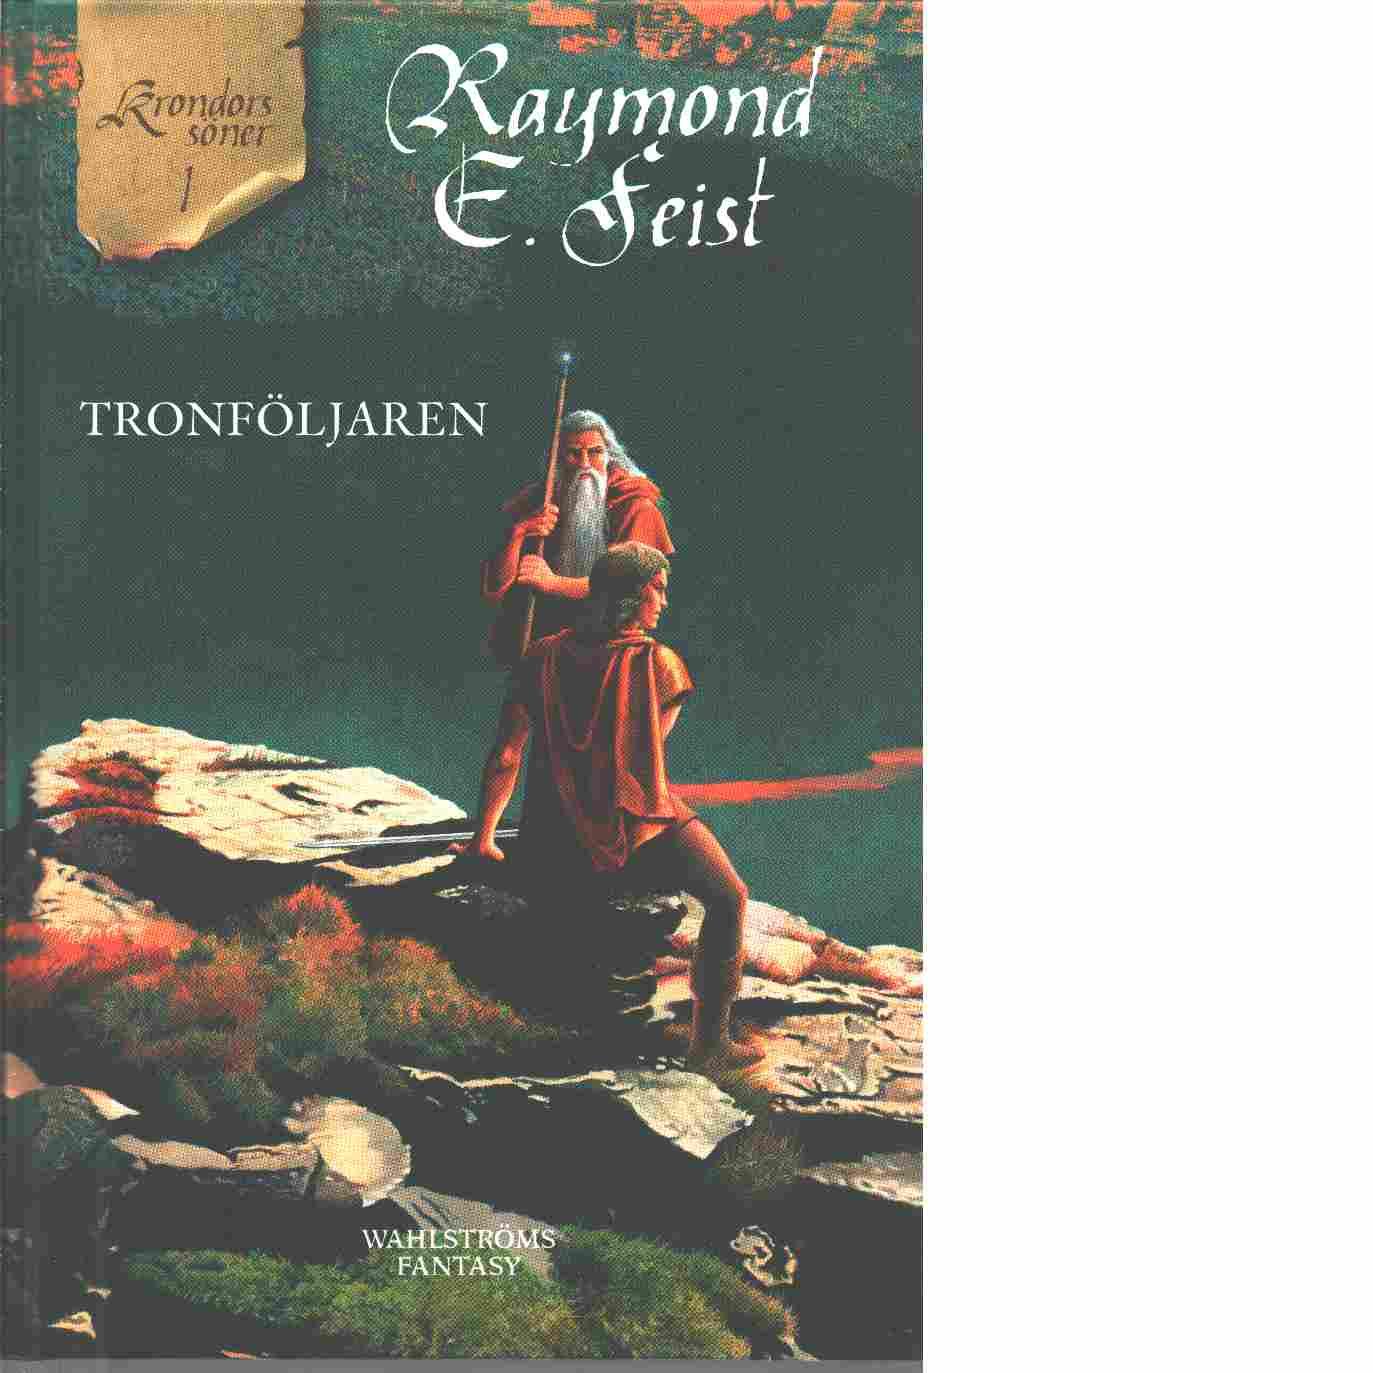 Tronföljaren - Krondors söner 1 - Feist, Raymond E.